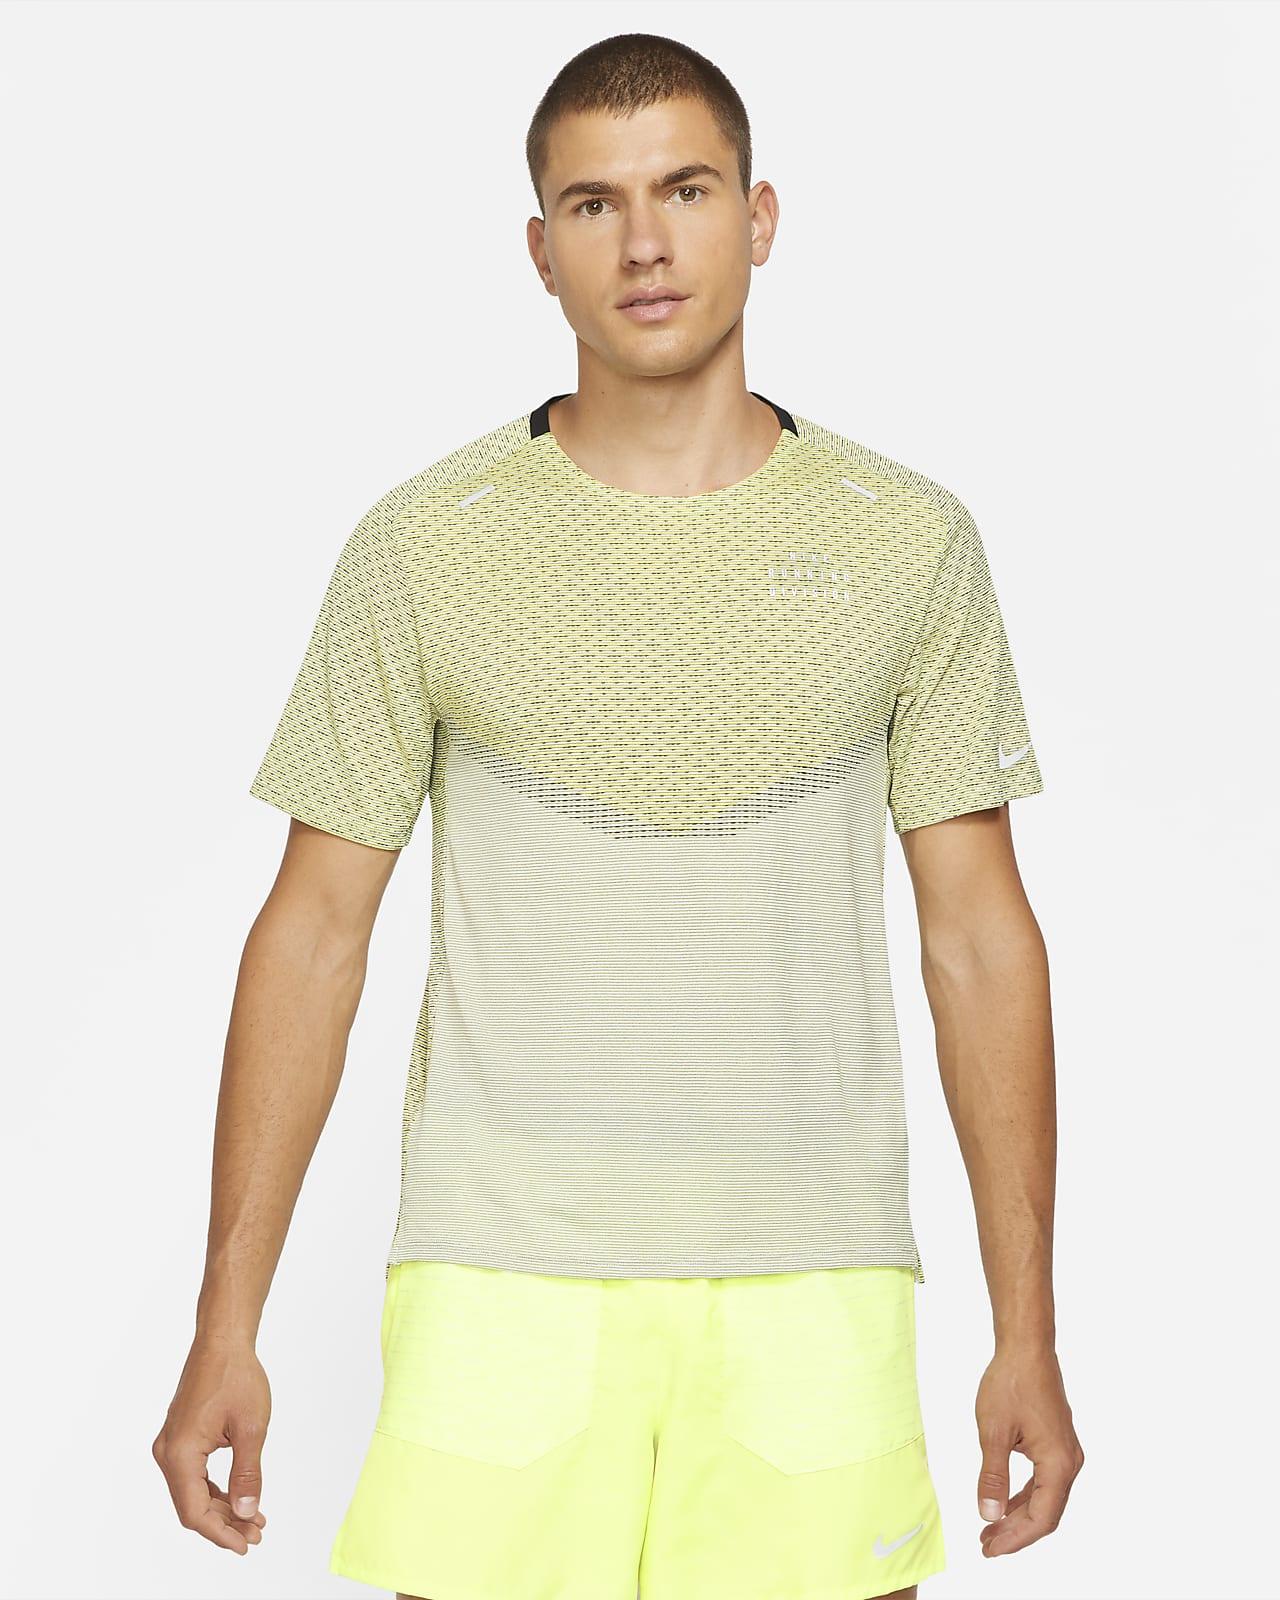 Мужская футболка с коротким рукавом Nike Dri-FIT ADV Run Division Techknit